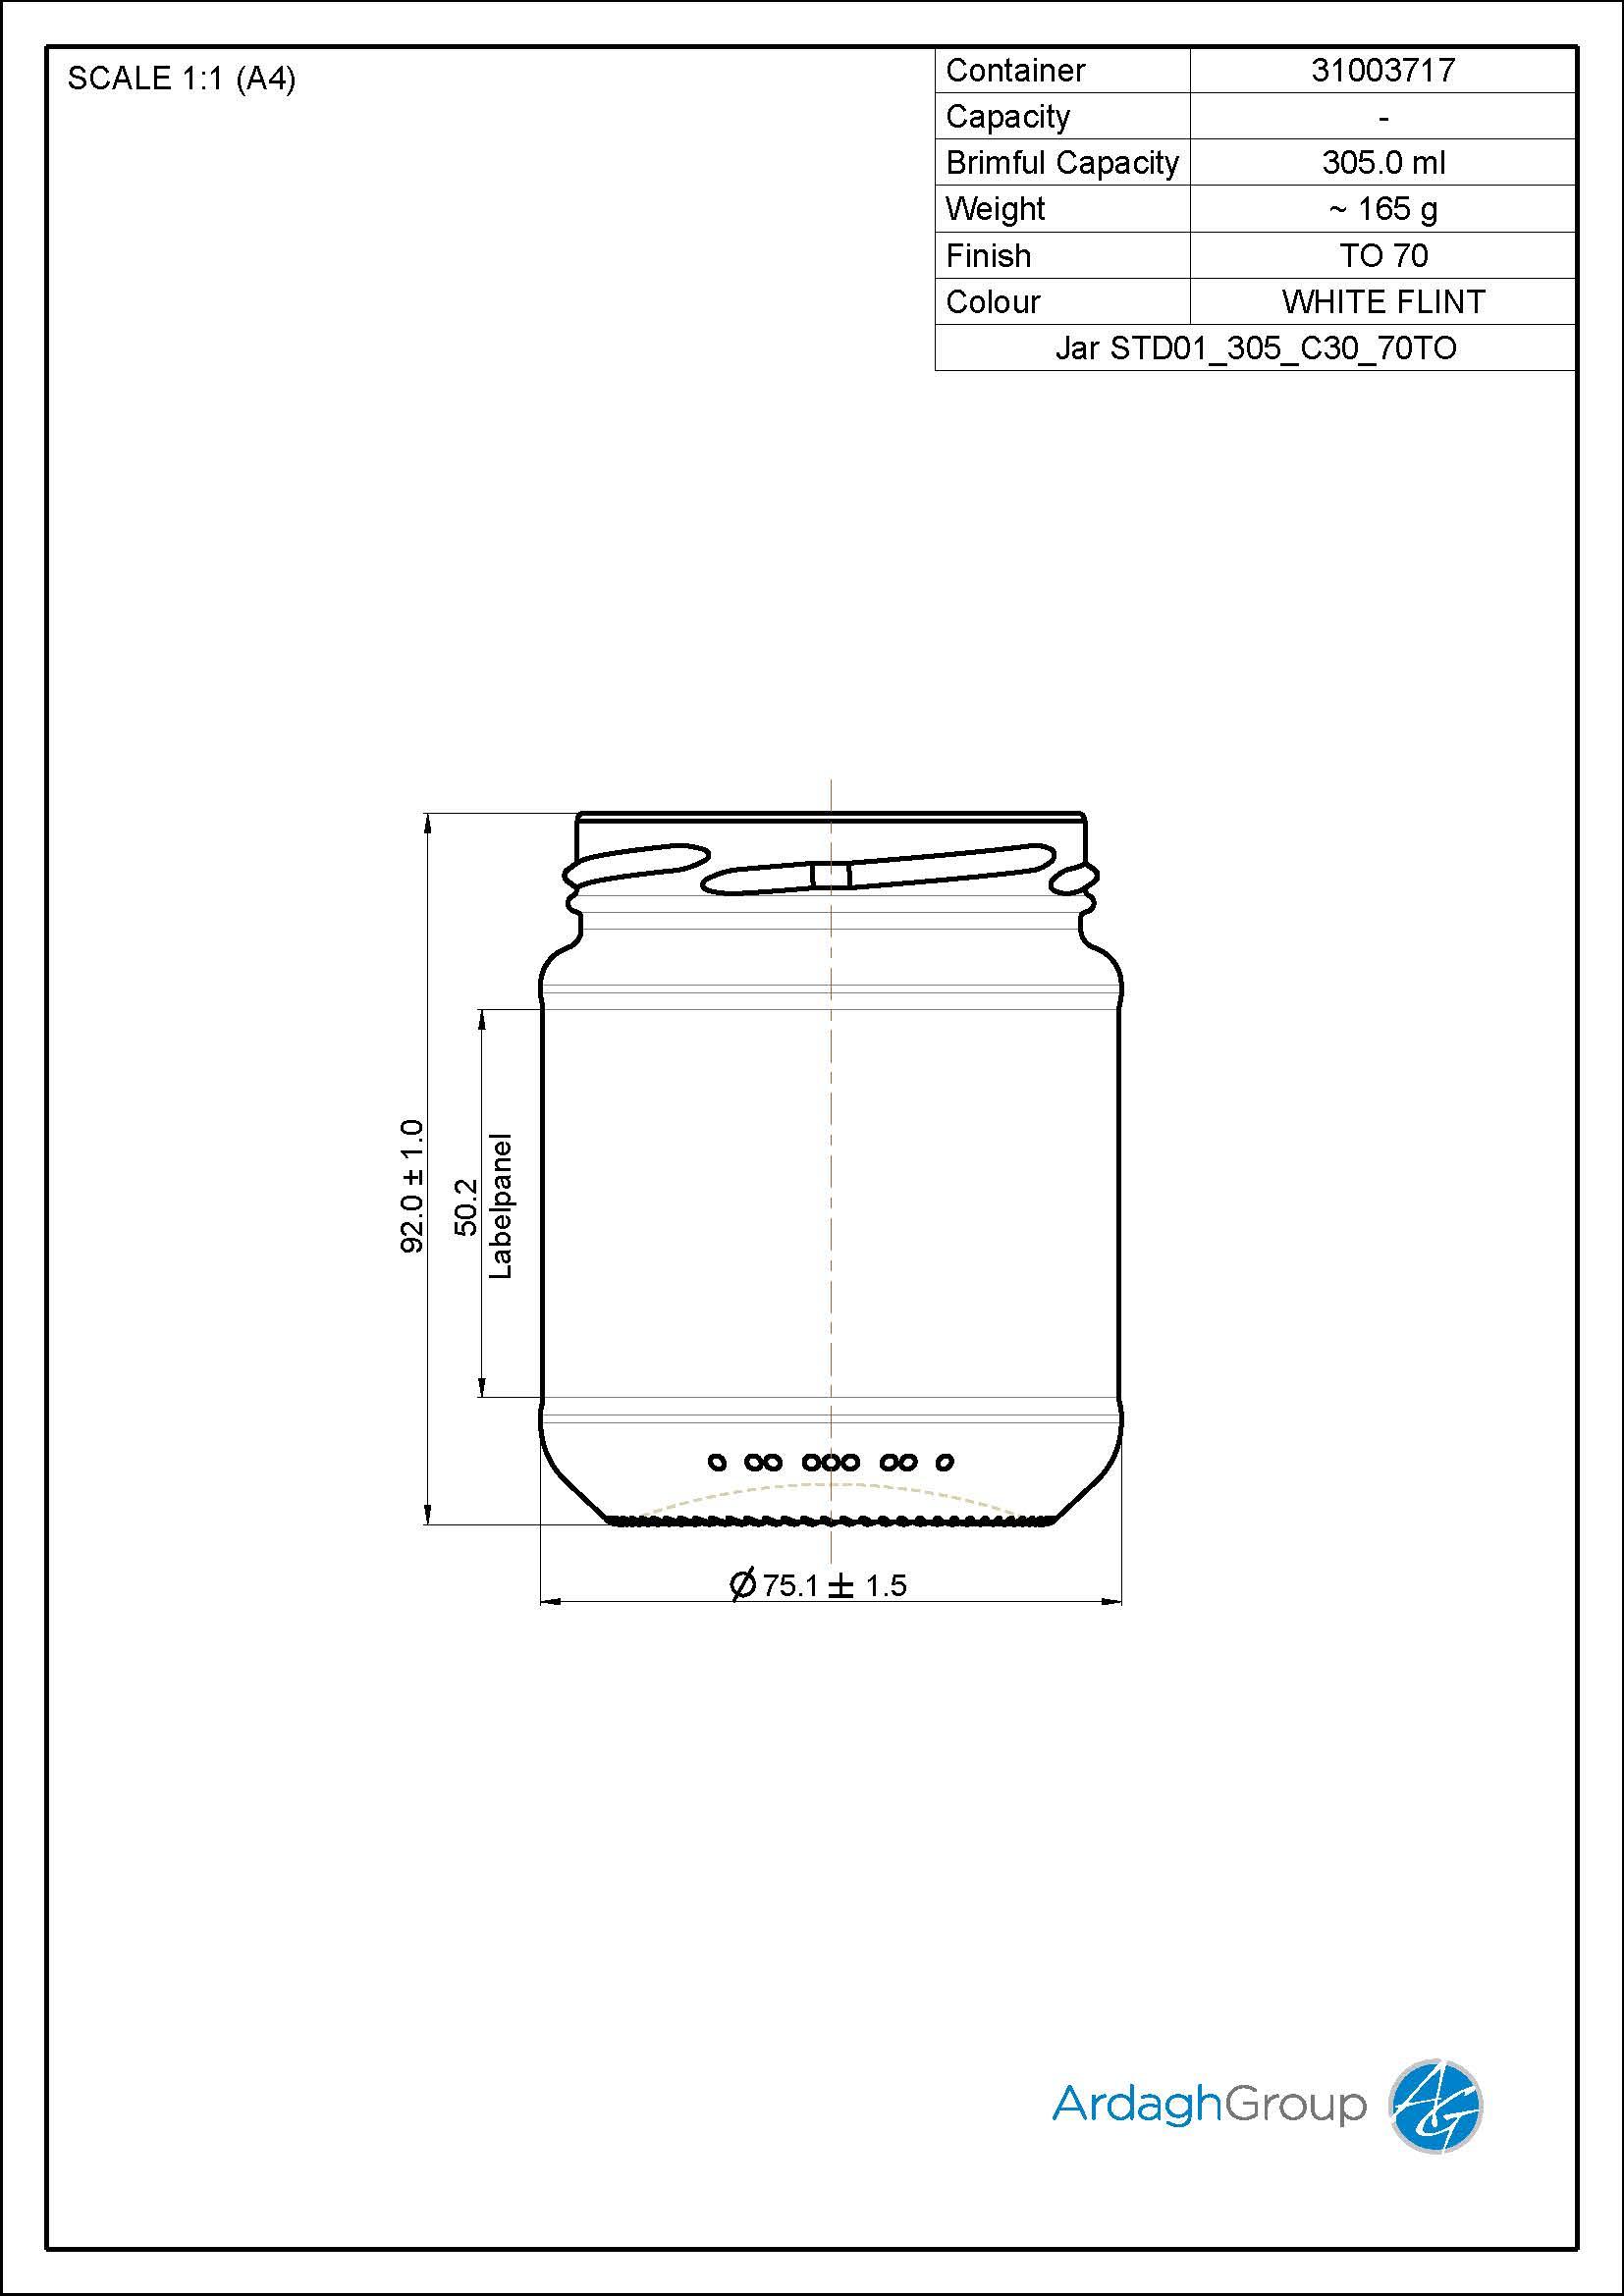 Jar STD01 305 C30 70TO